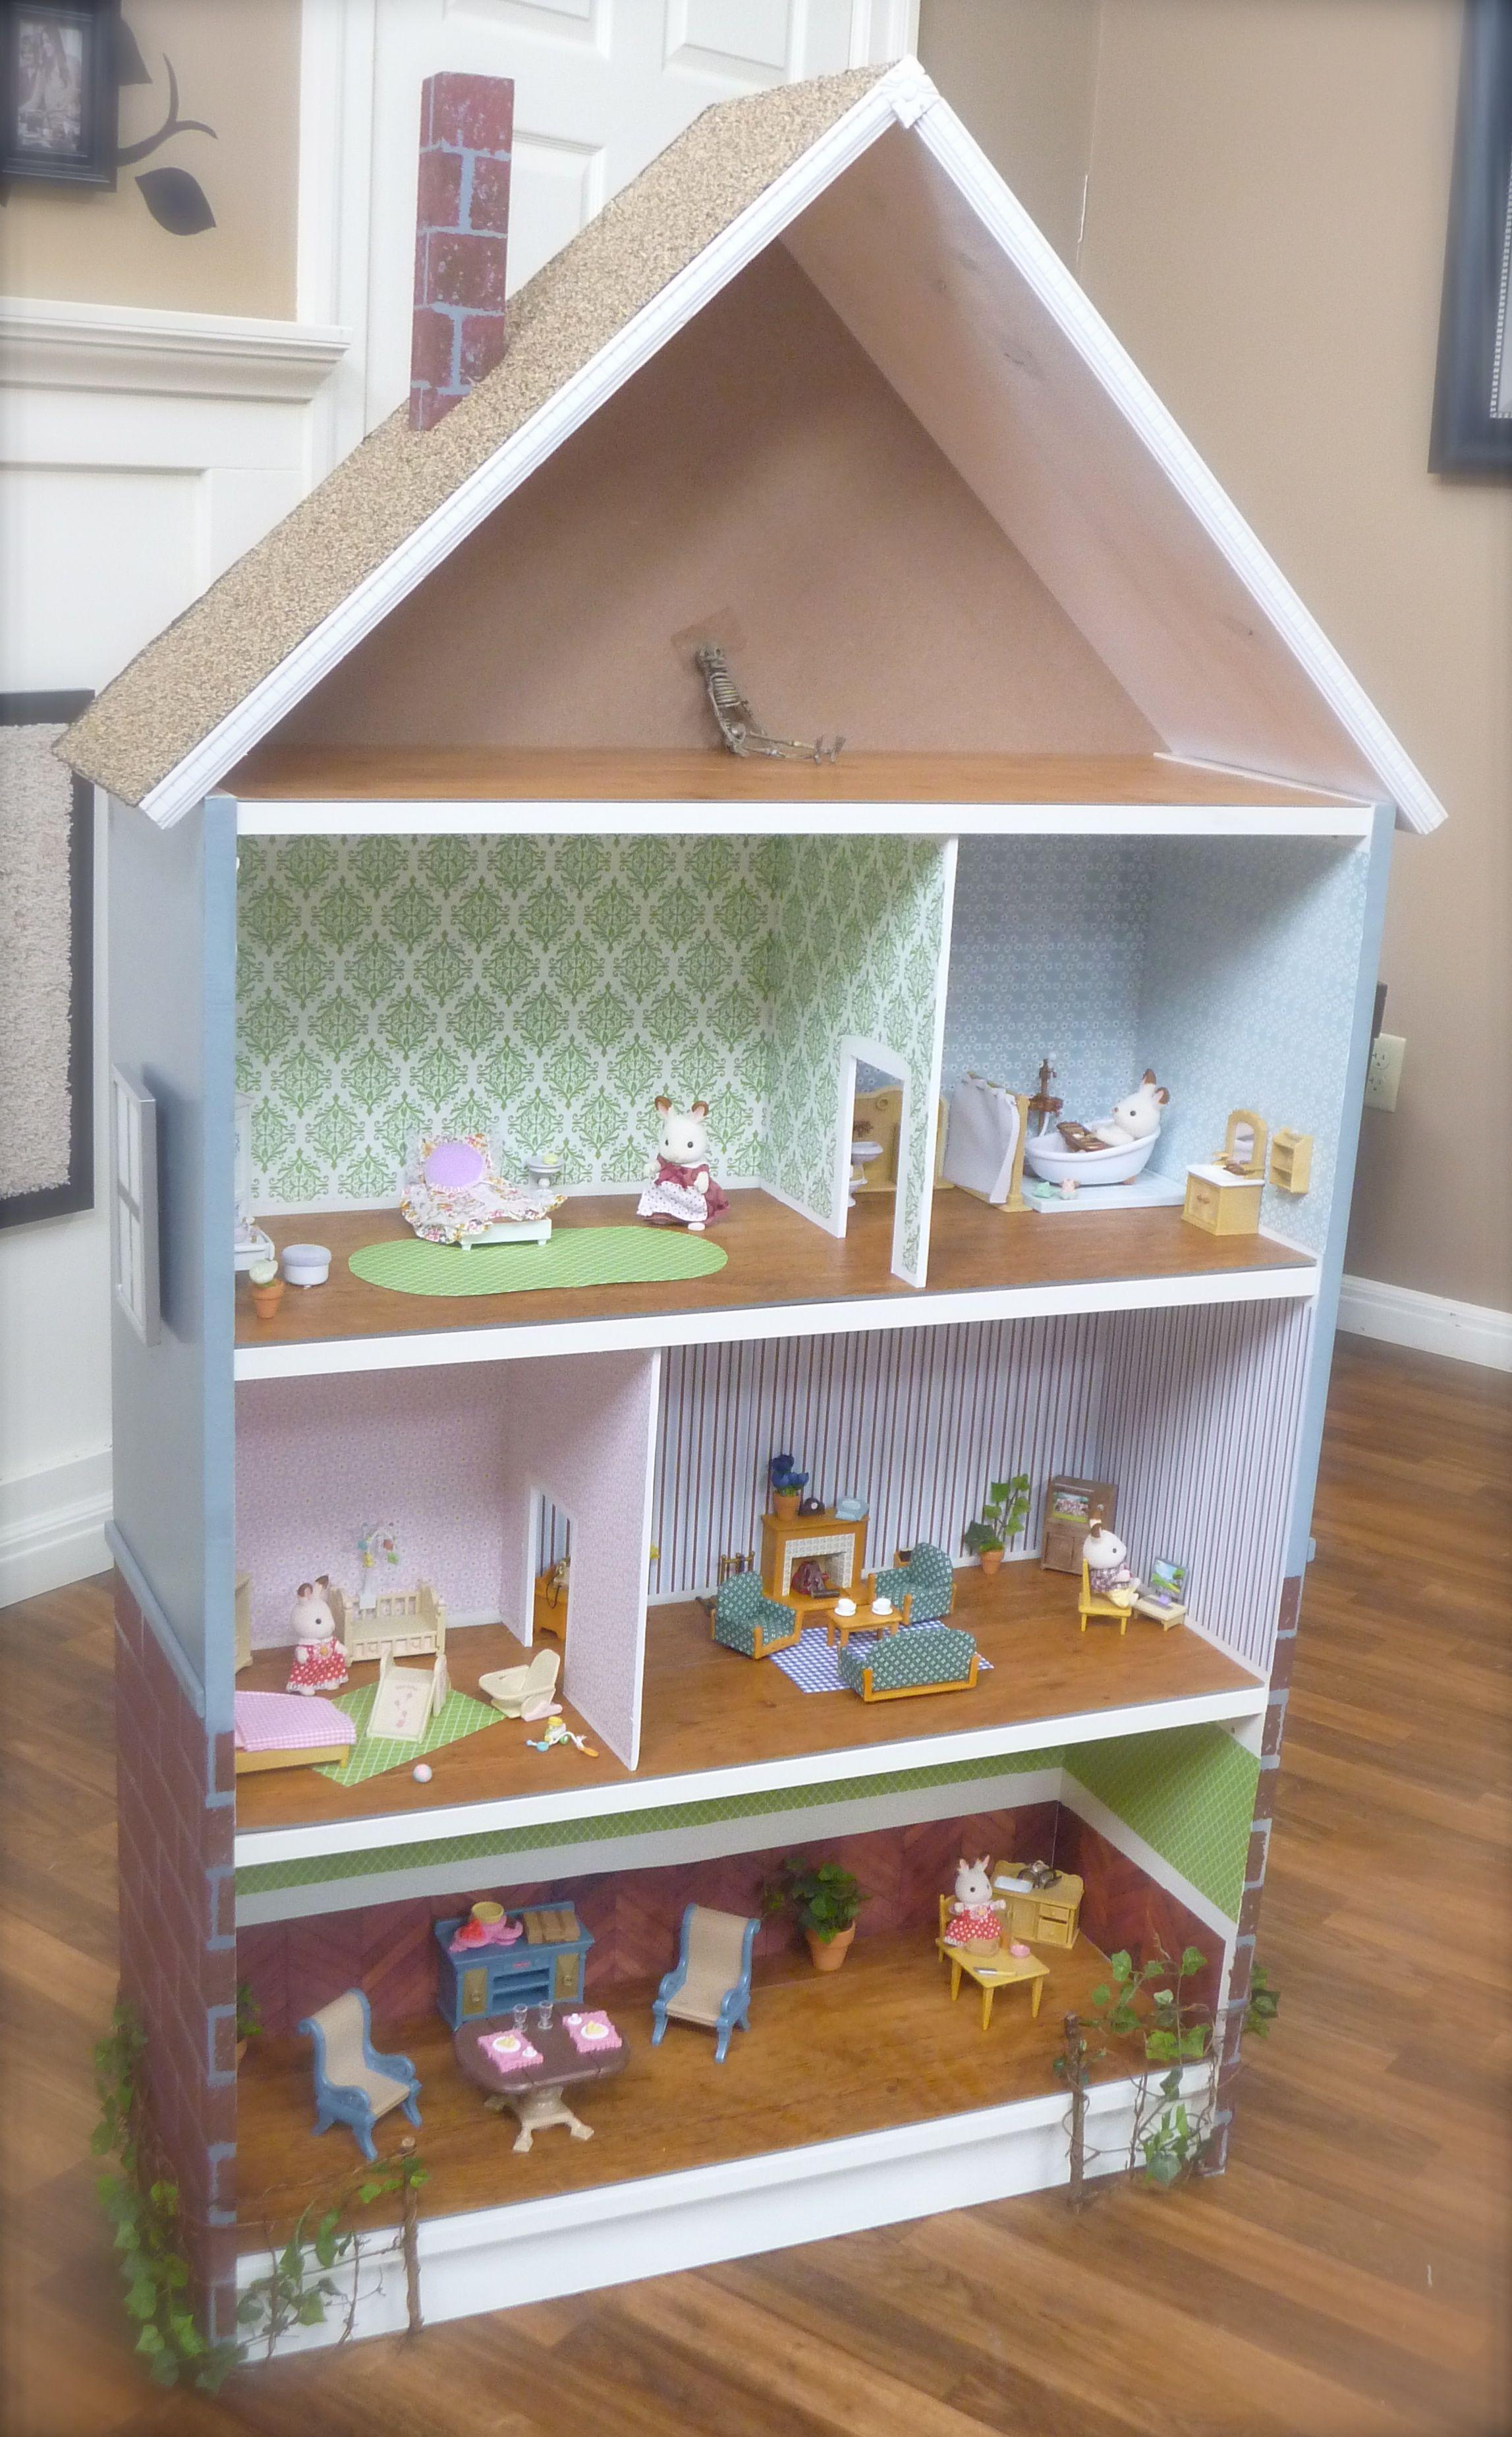 Design Make Your Own Dollhouse dollhouse bookcase beach cottage brick row house cute ikea hack